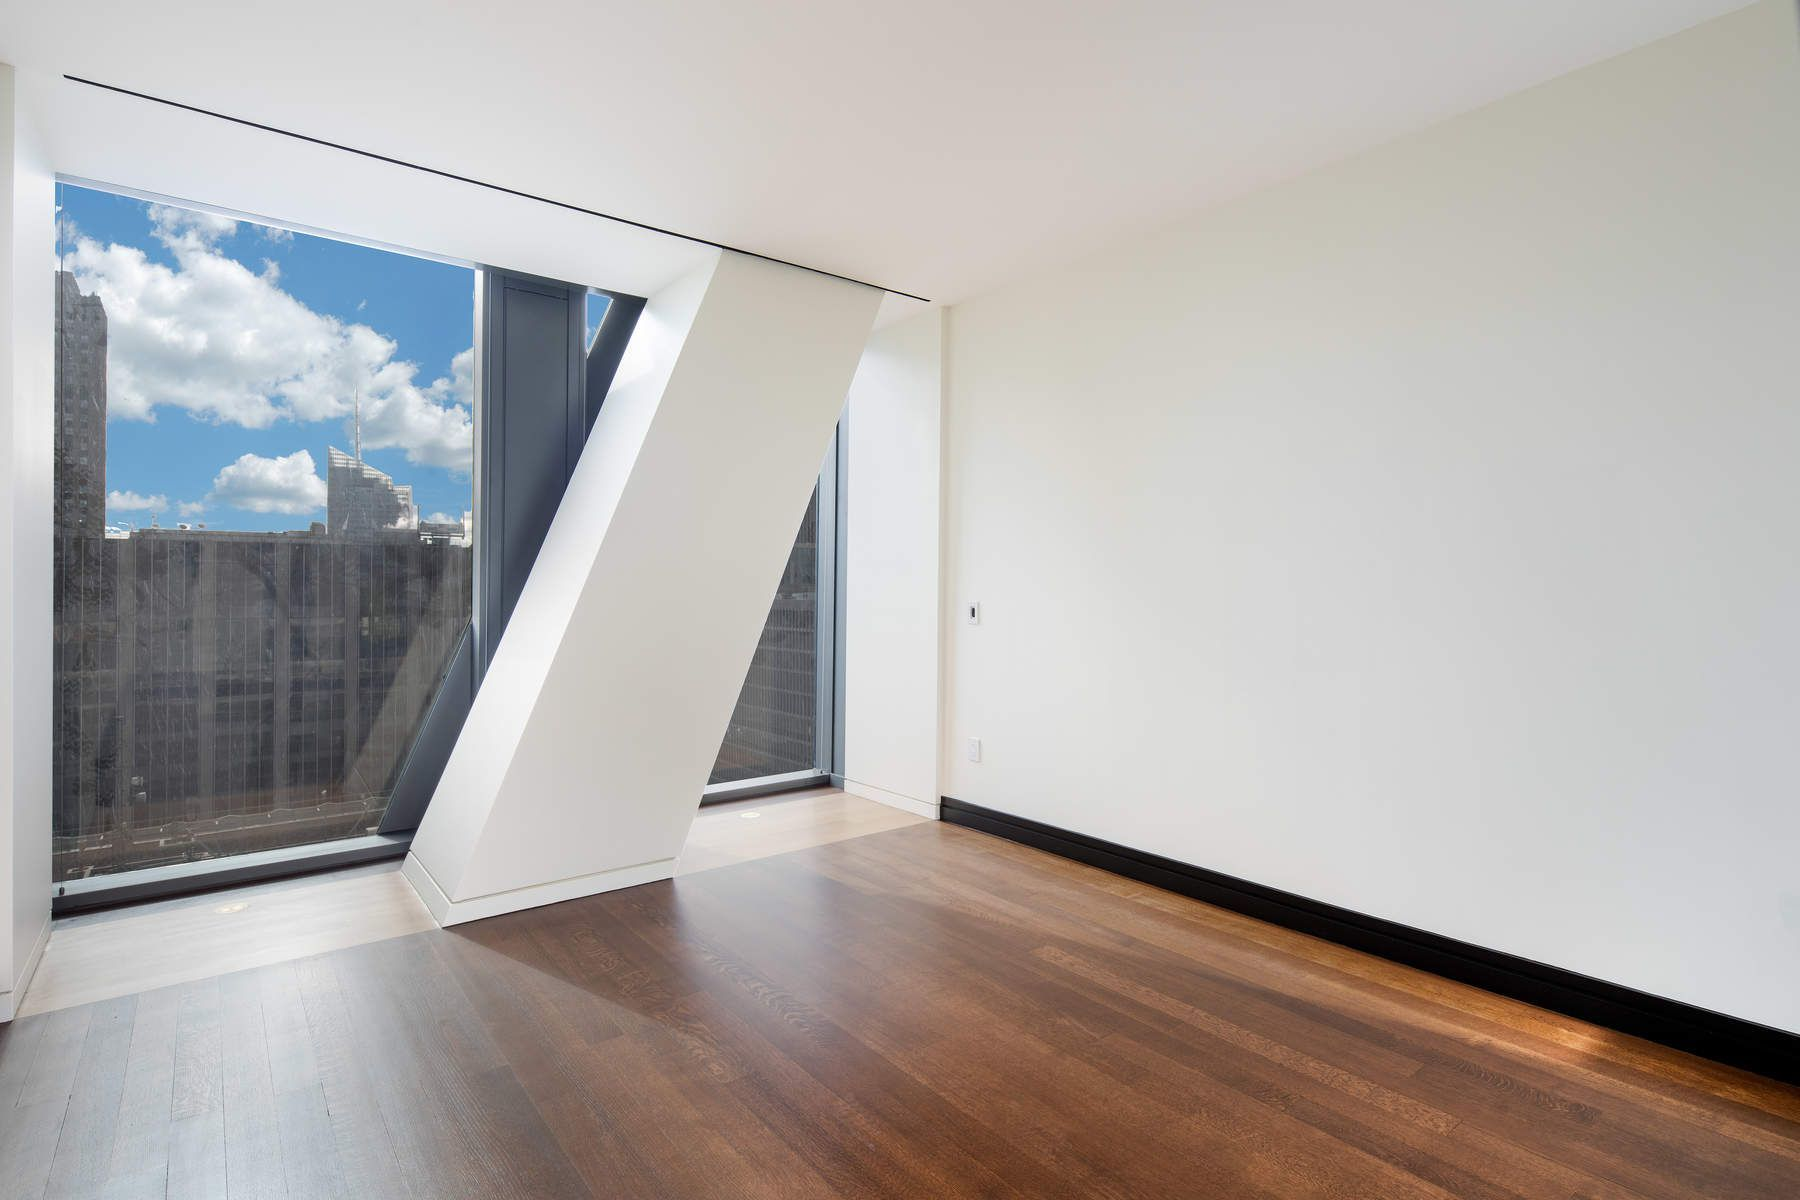 53 West 53rd Street Interior Photo